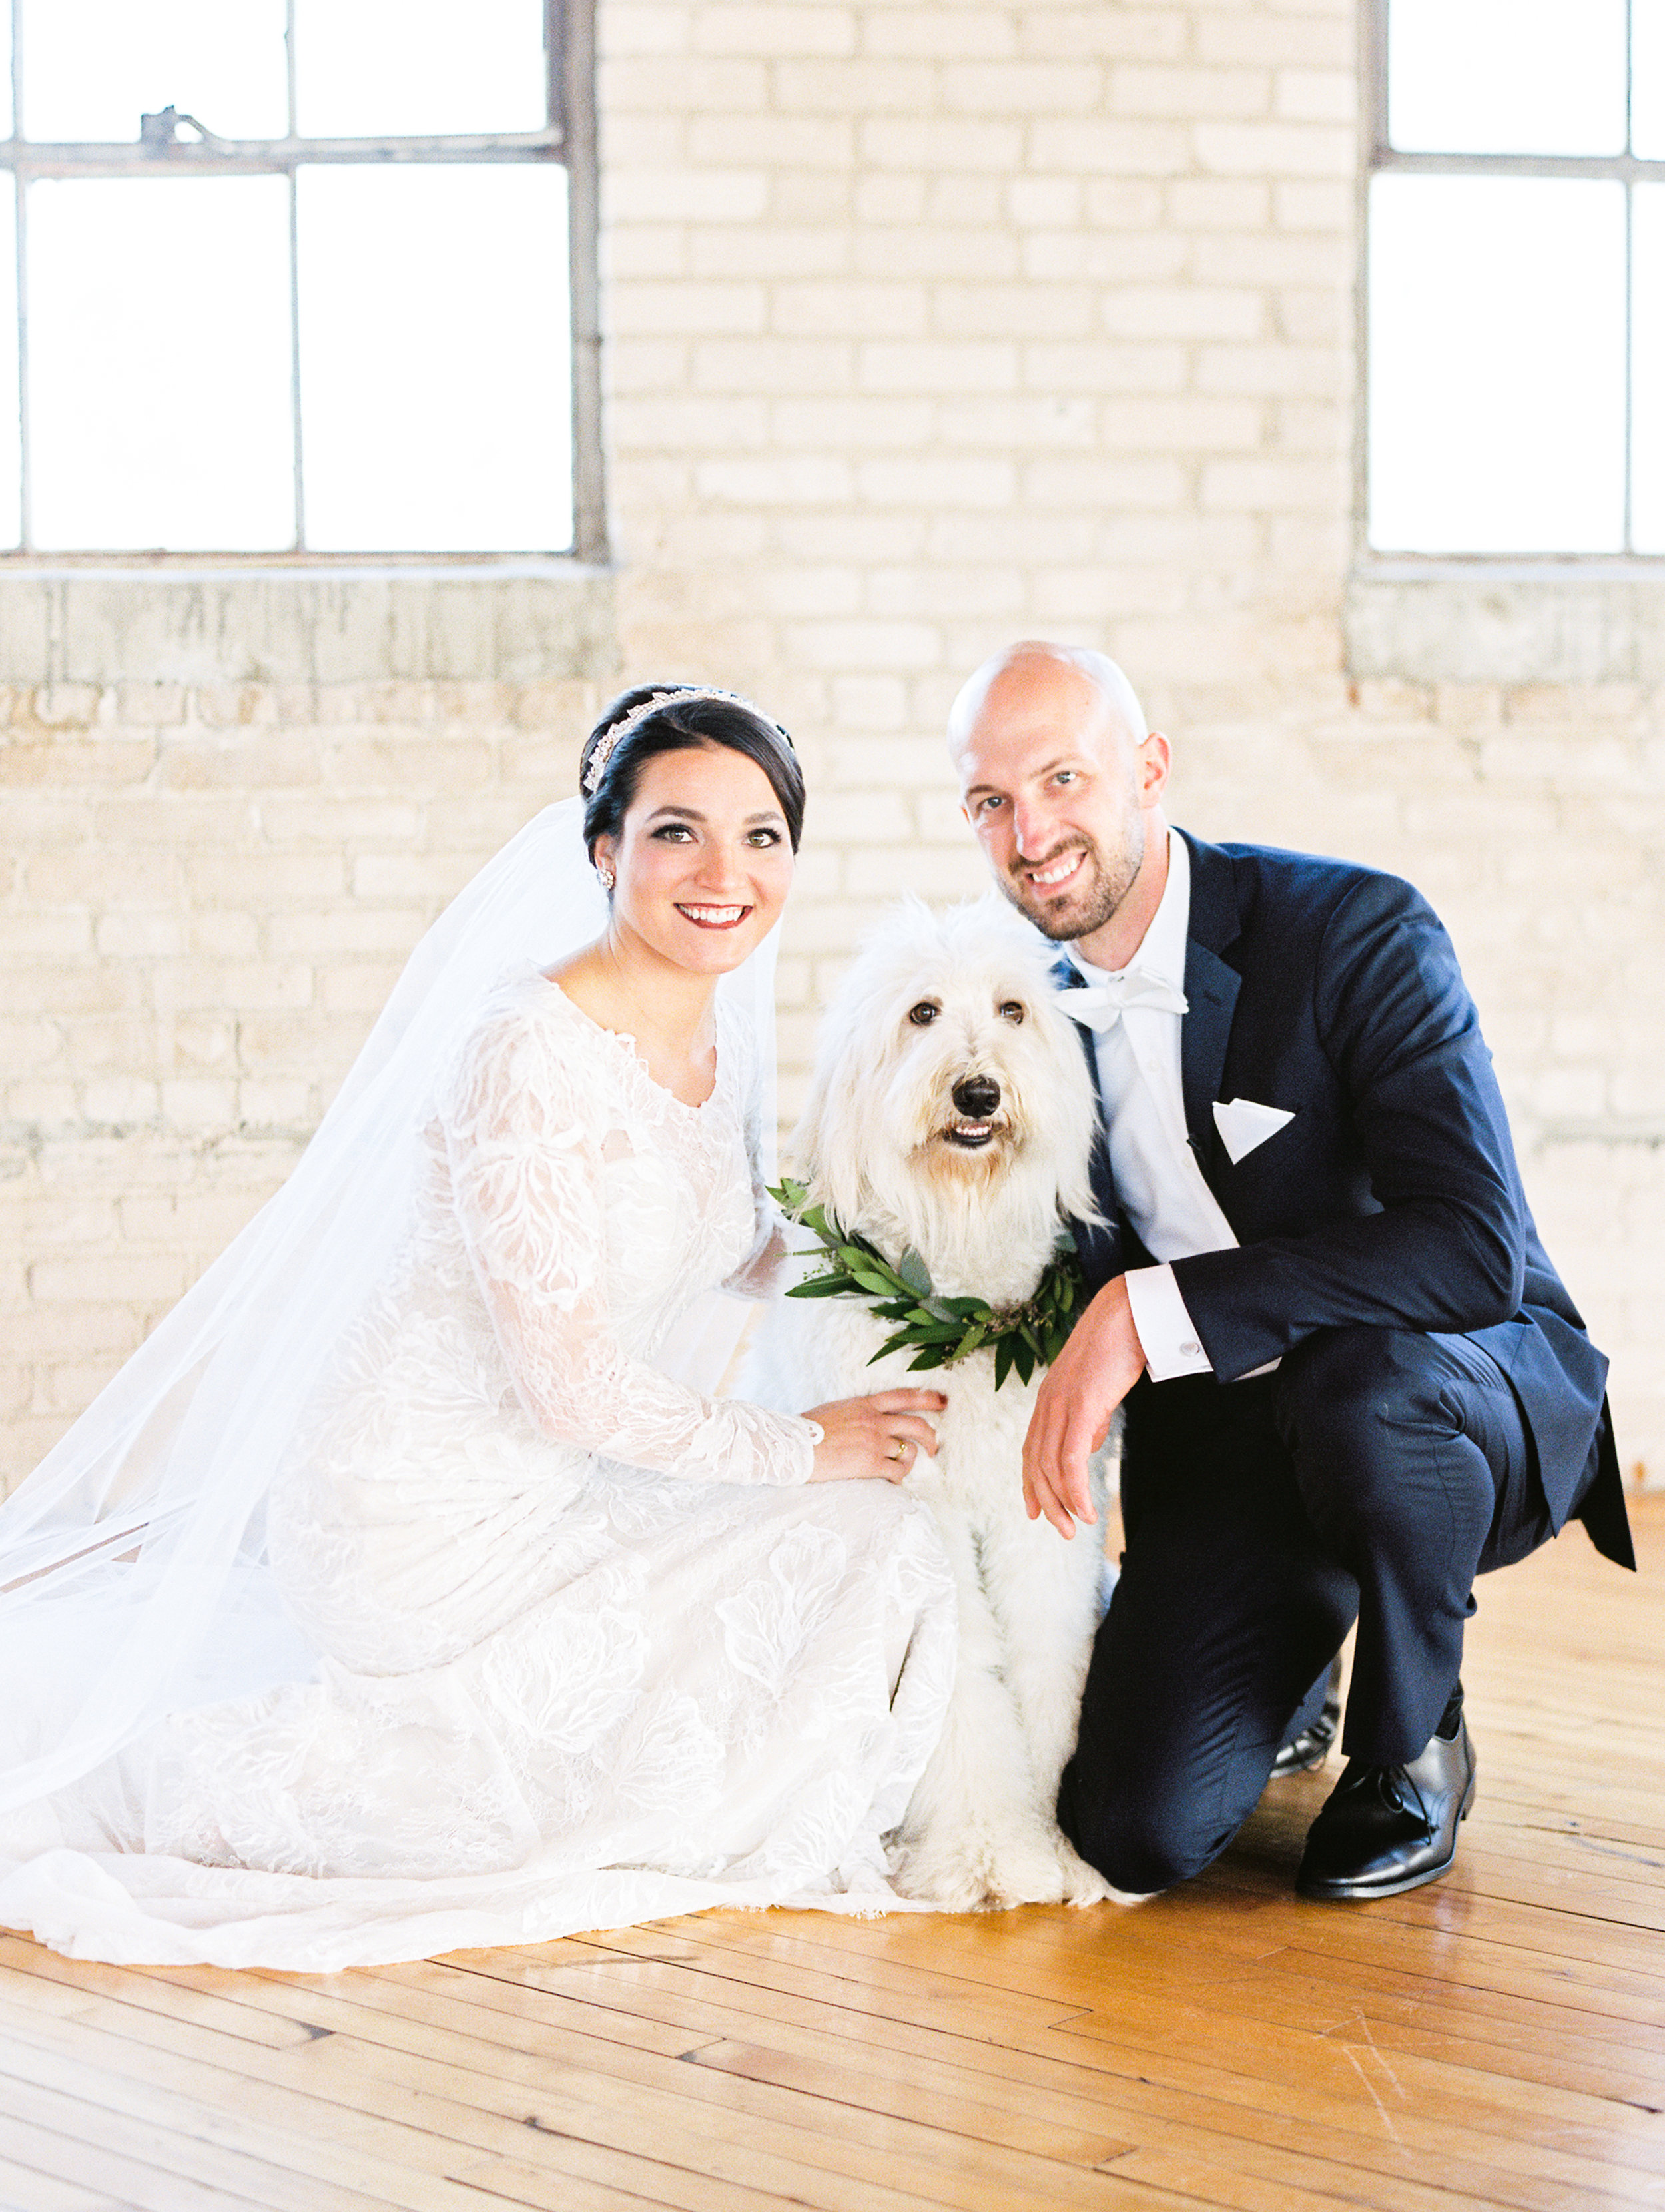 Vogelzang+Wedding+first+look+b-11.jpg